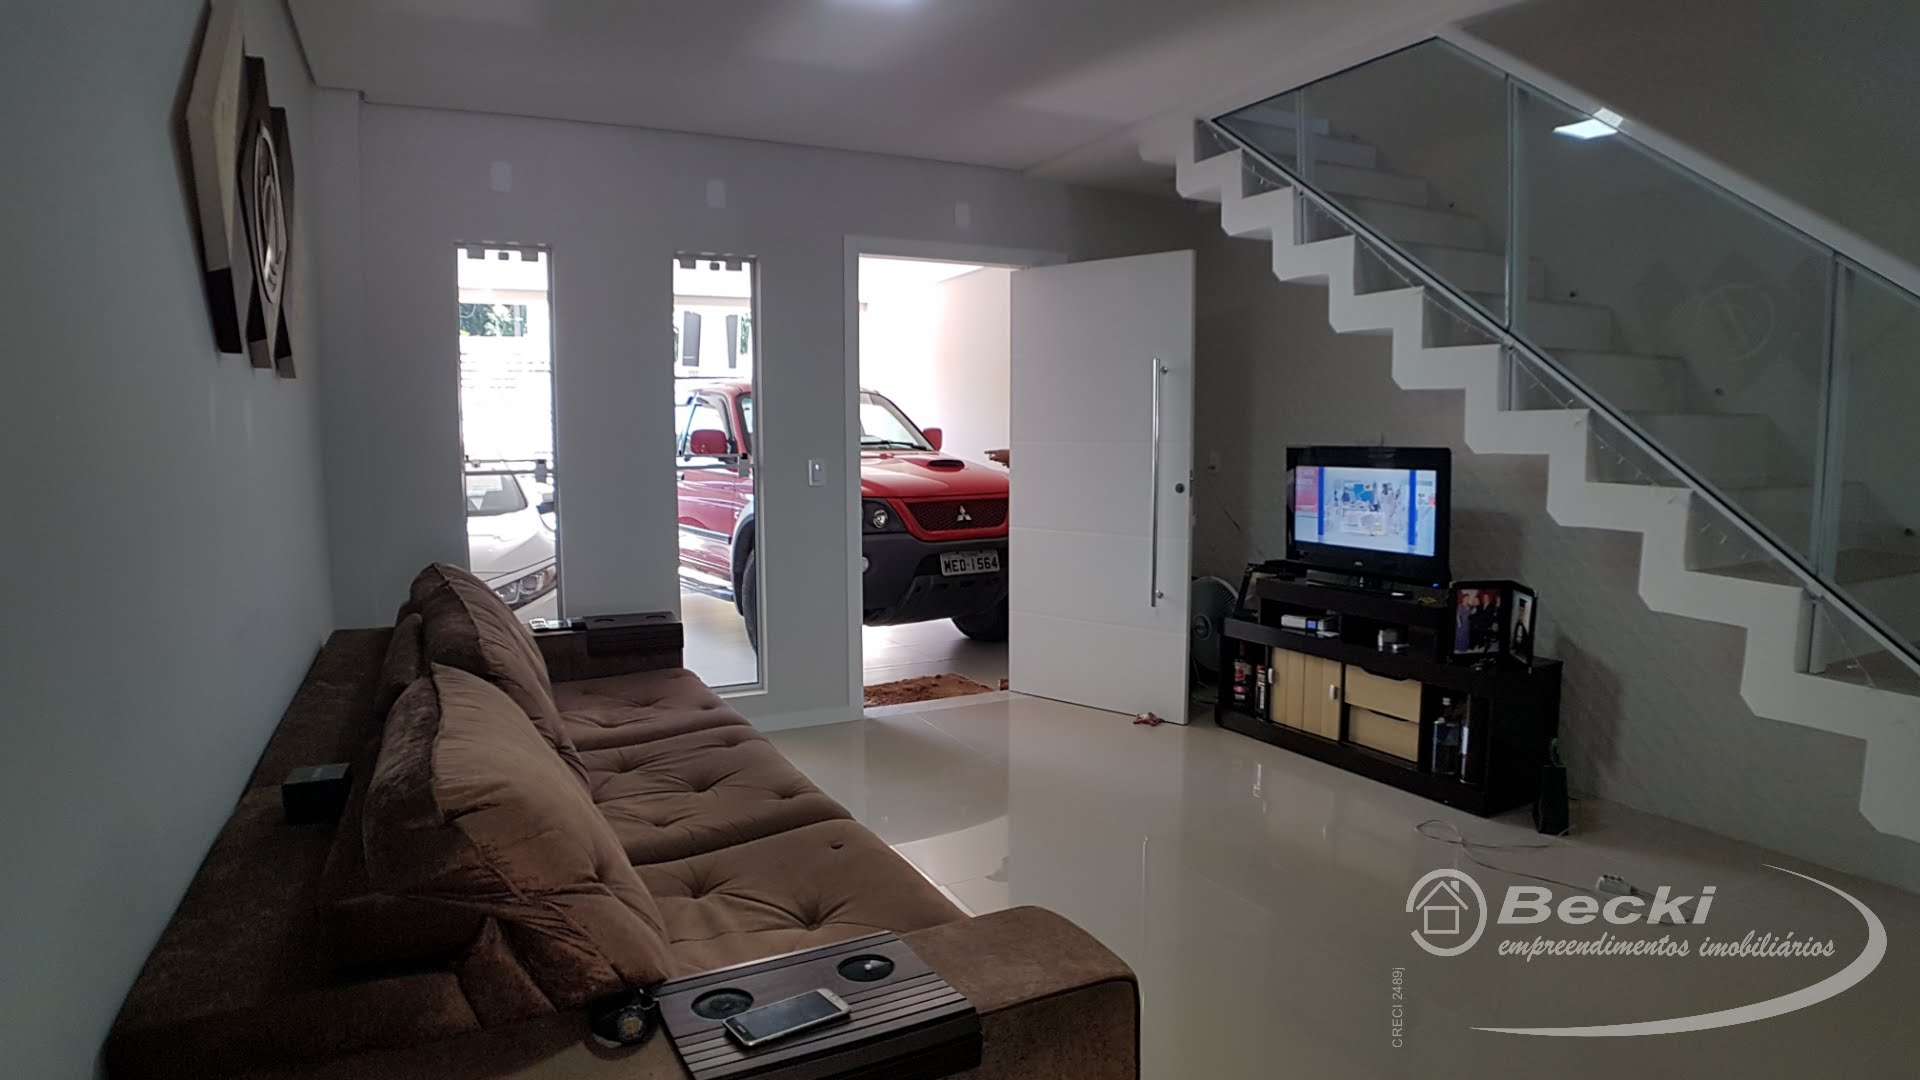 Casa à venda  no Saguaçu - Joinville, SC. Imóveis